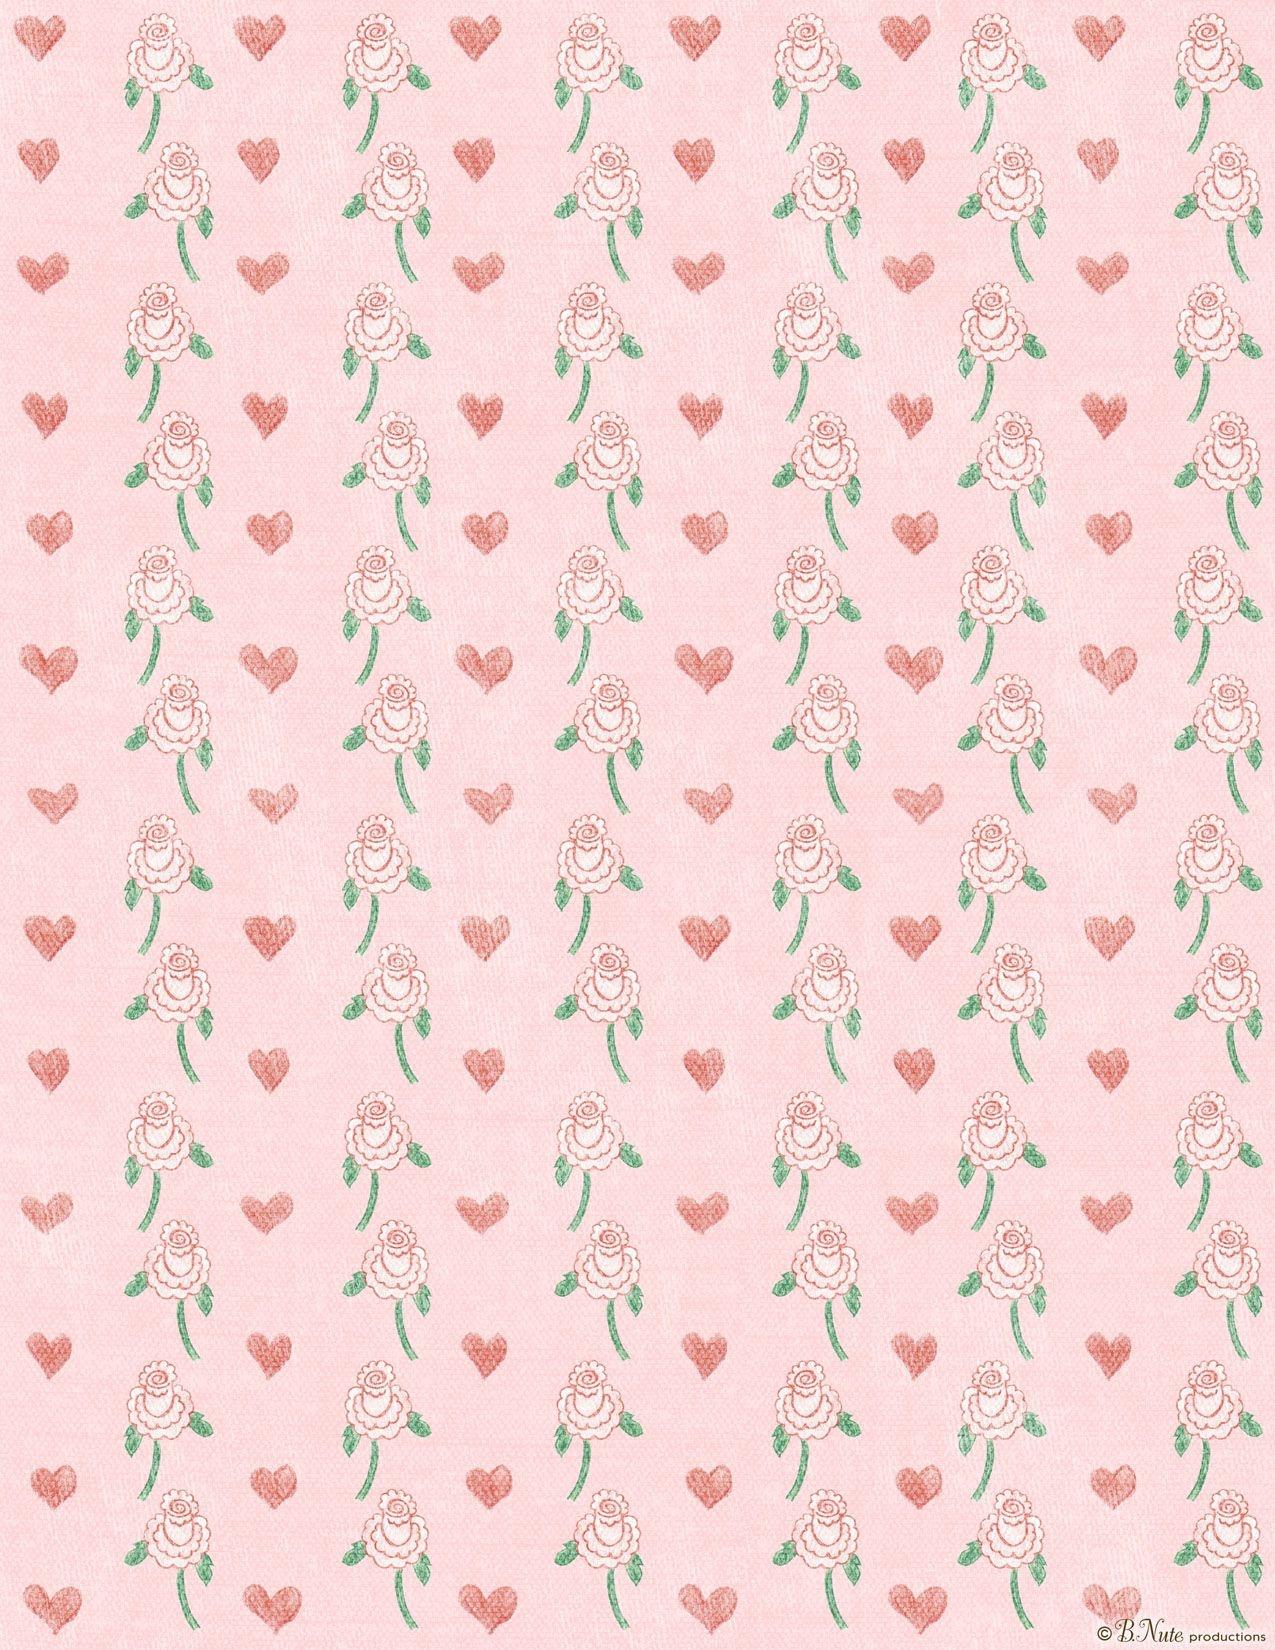 Free Paper Designs To Print | Free Printable Hearts 'n Flowers - Free Printable Scrapbook Paper Designs